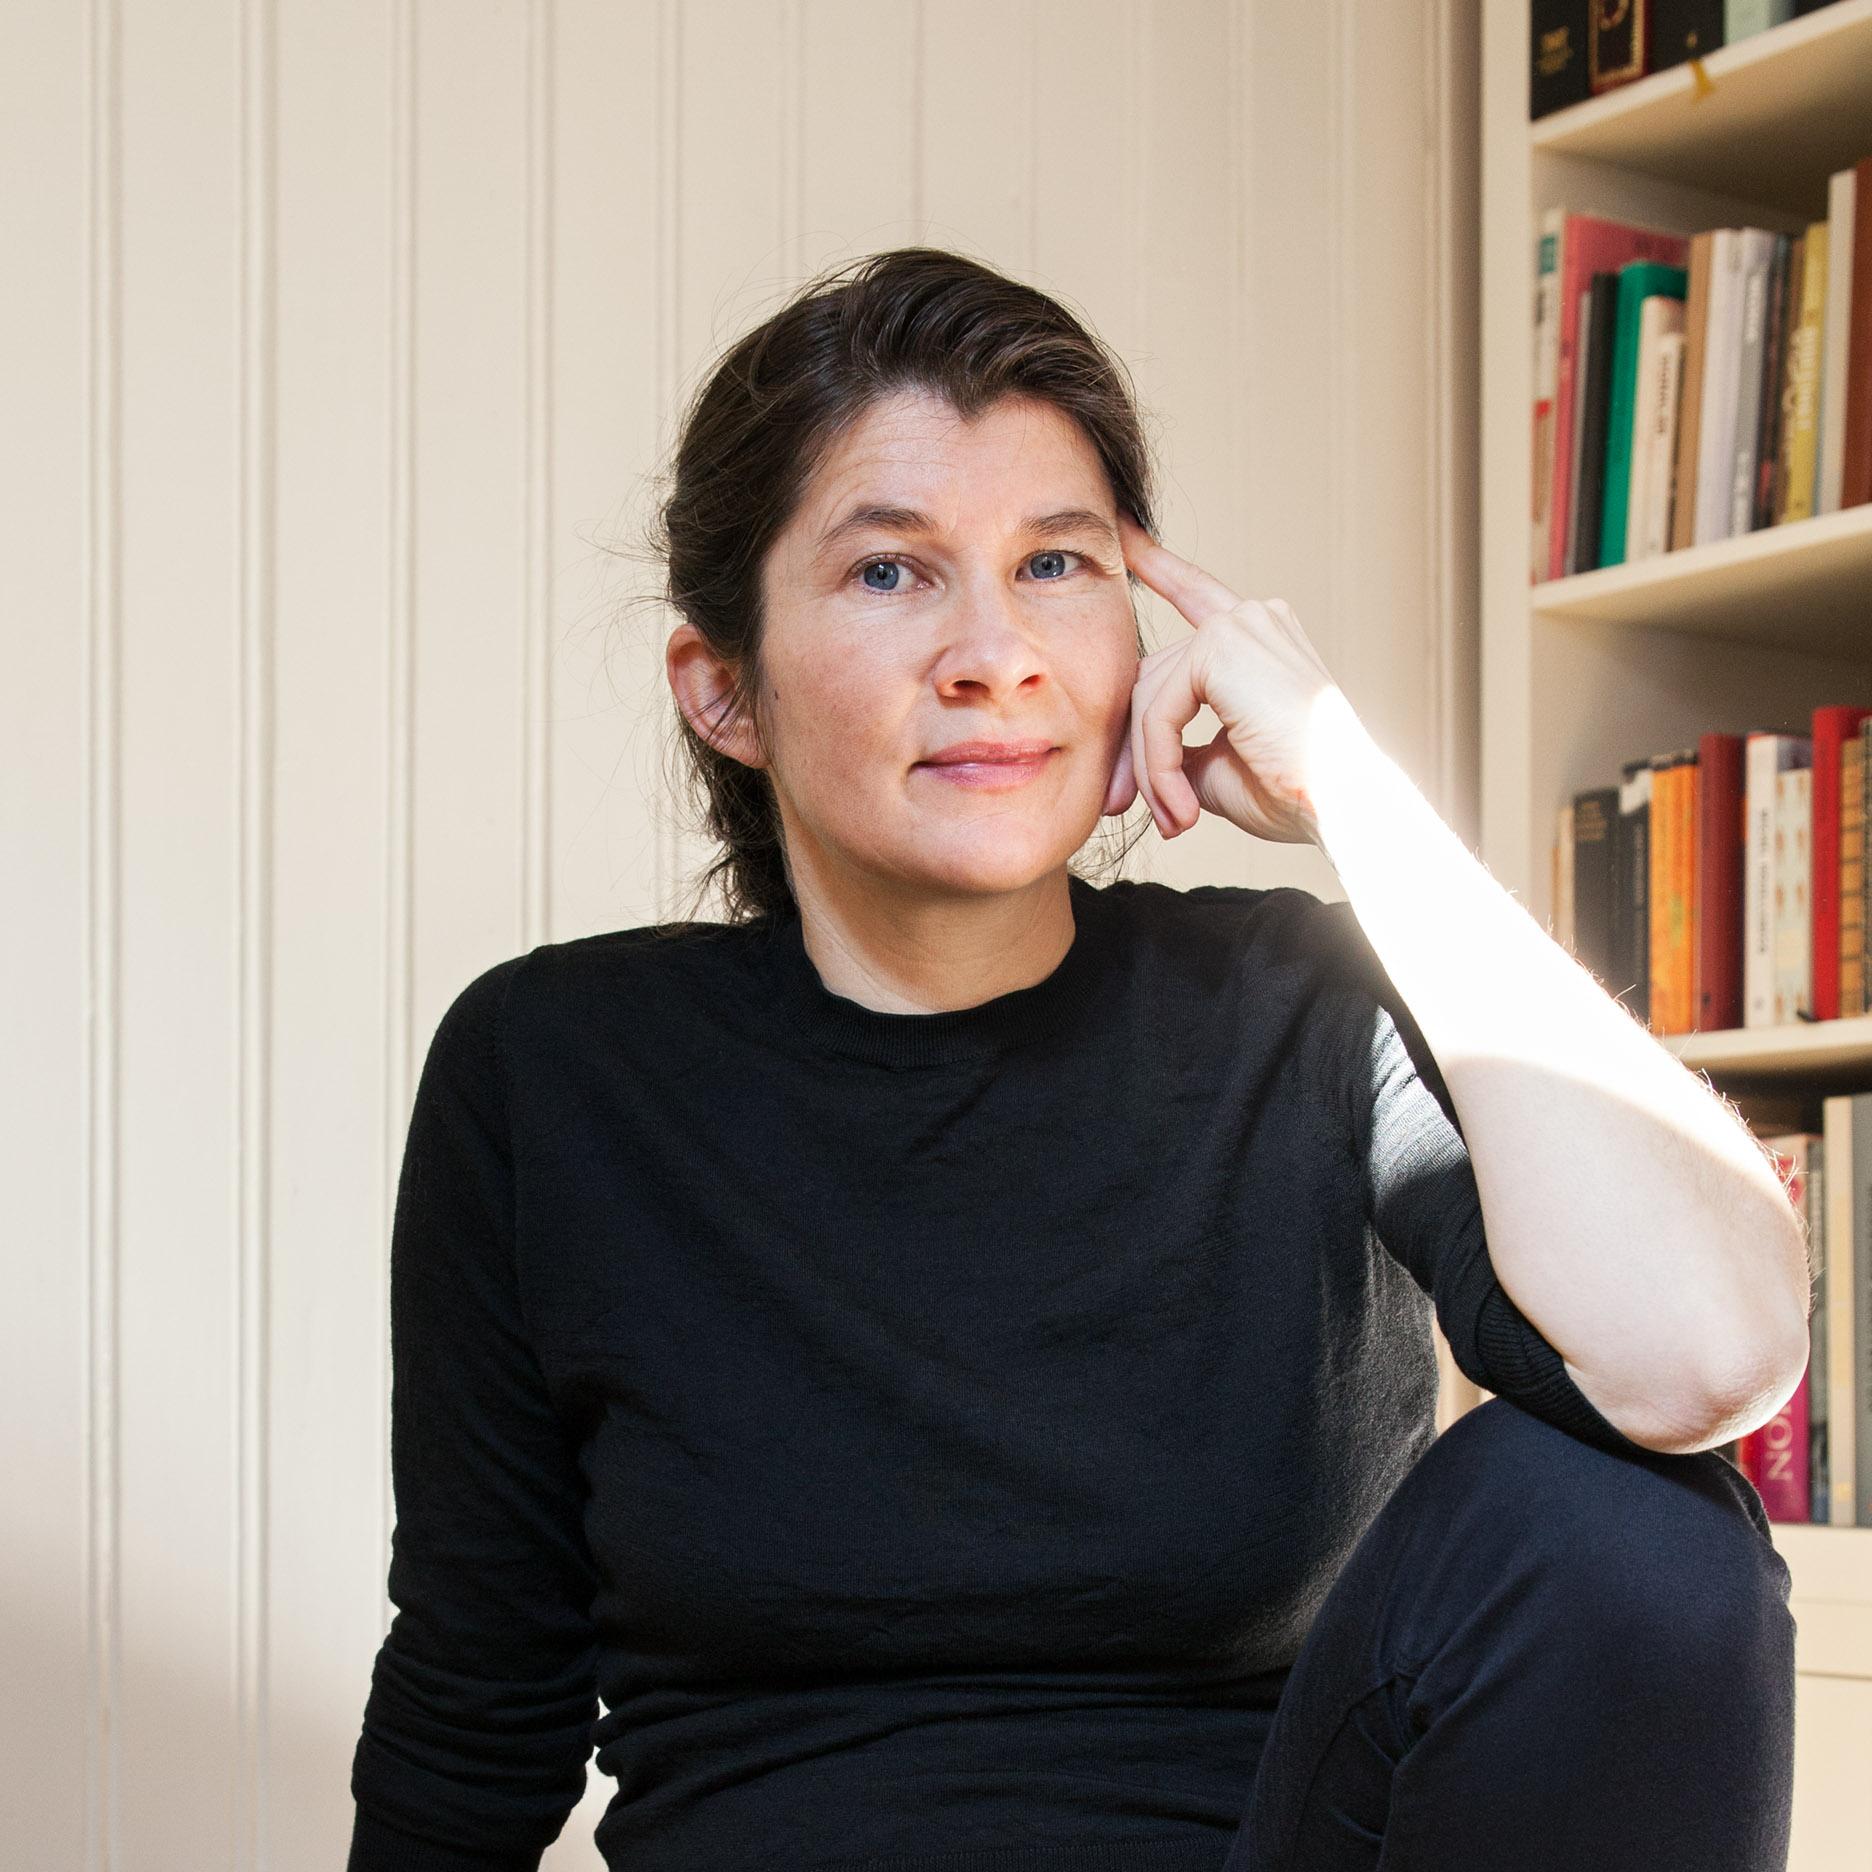 Aina Villanger, © Ingrid Eggen